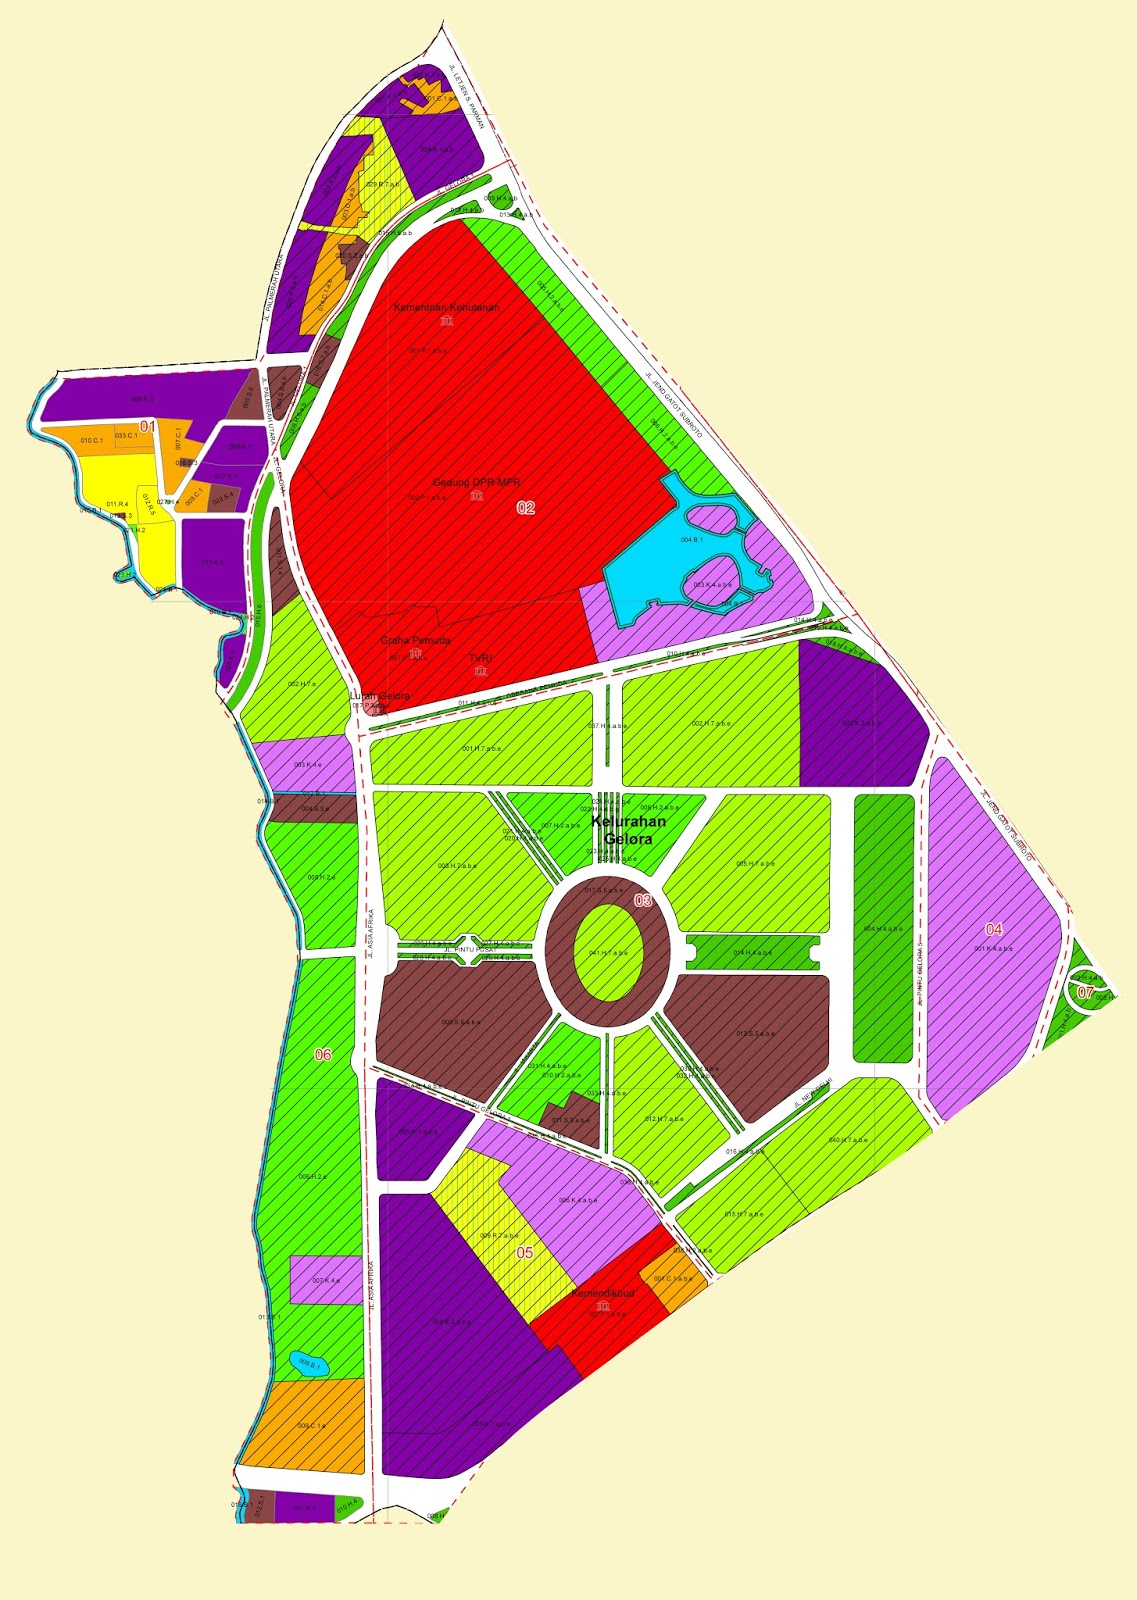 PTSP Gelora: Peta Zonasi Kelurahan Gelora